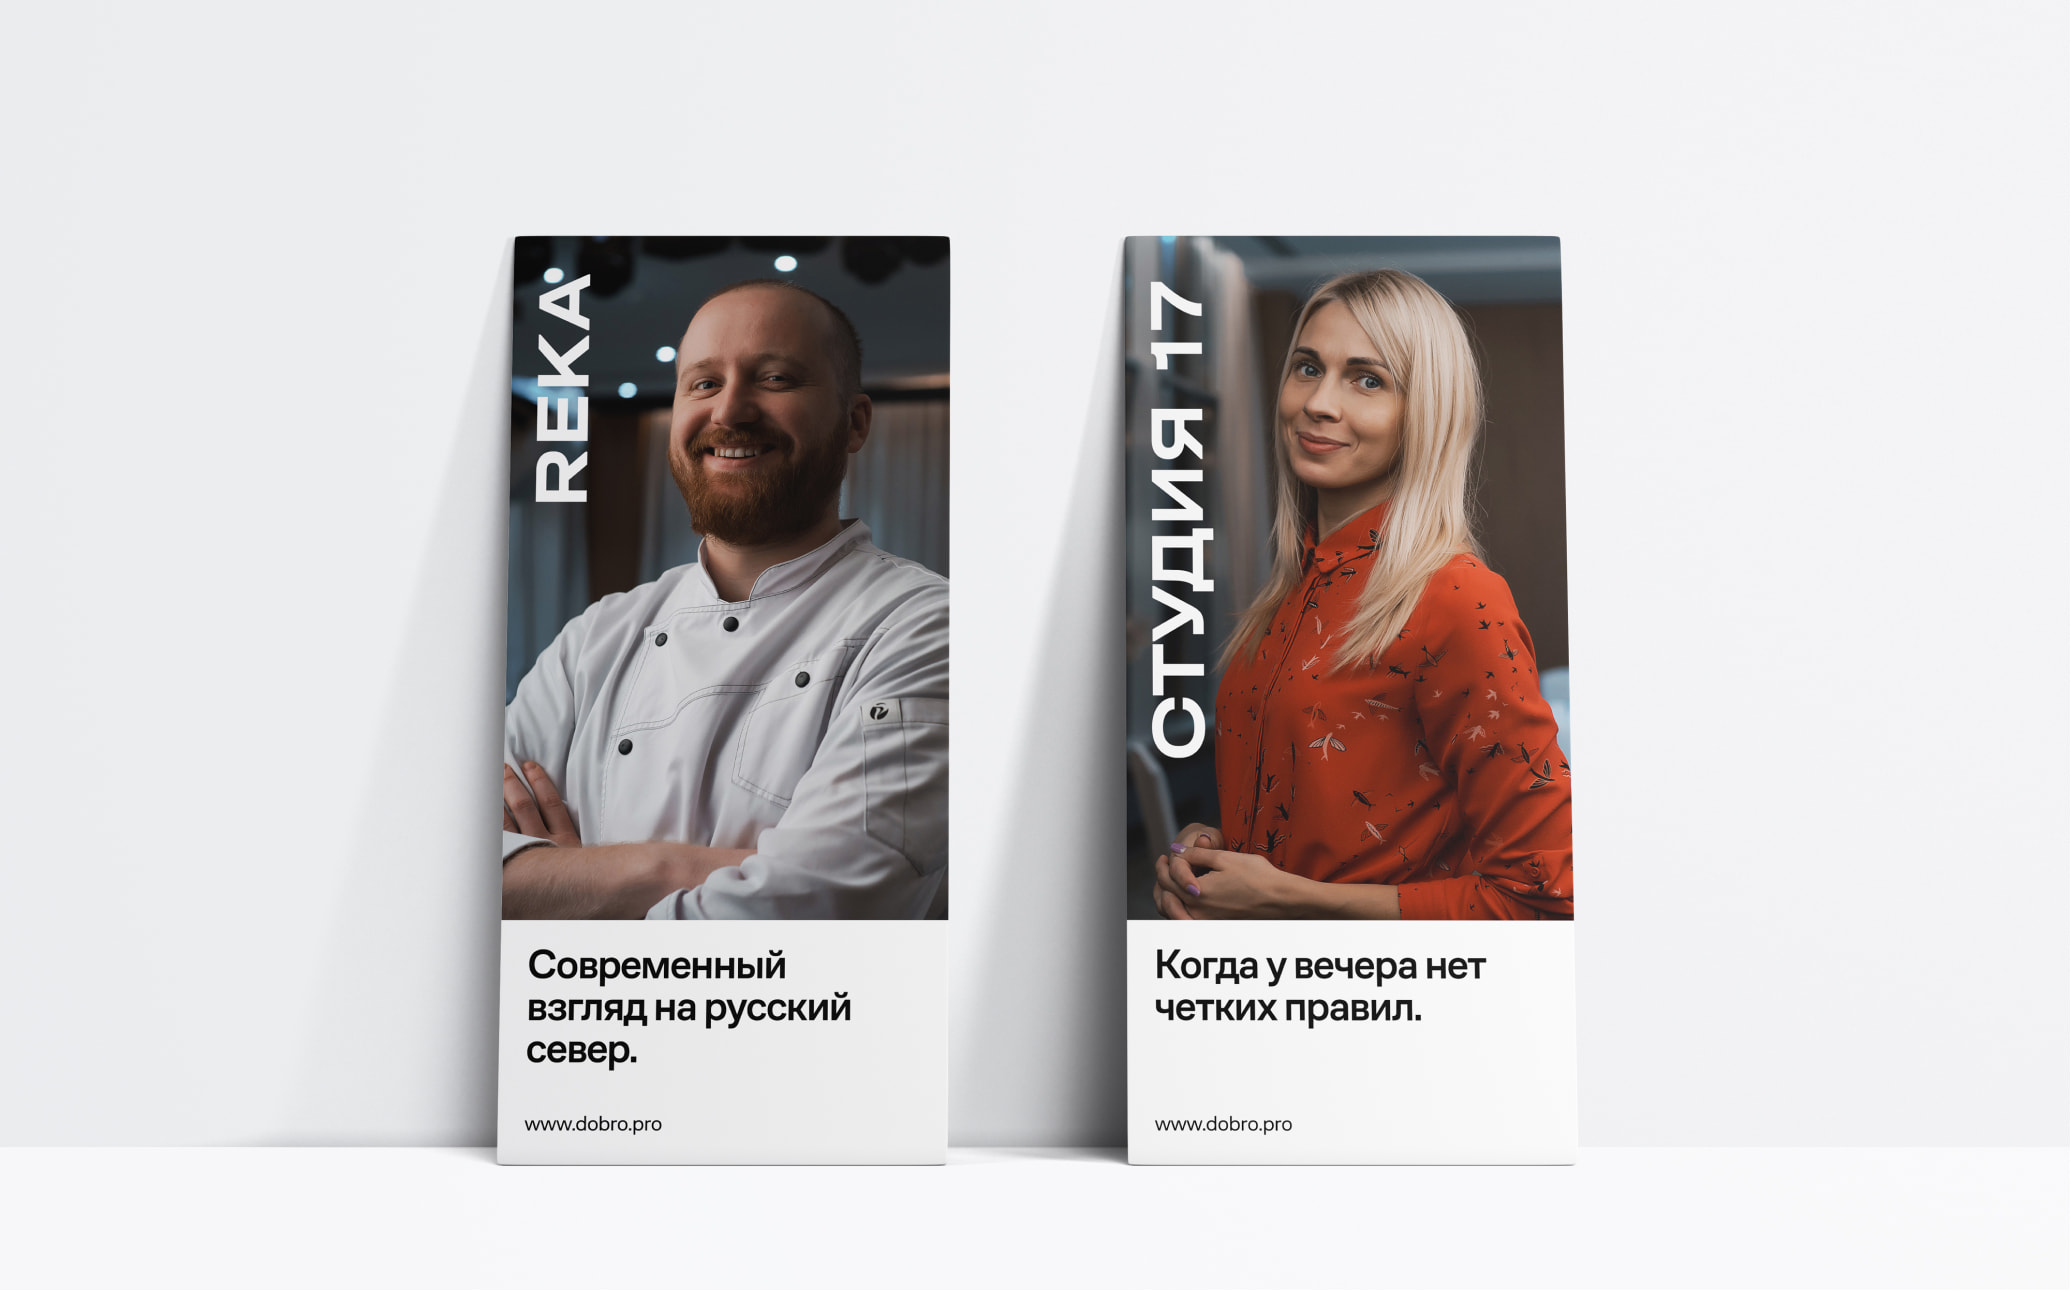 dobropro_17